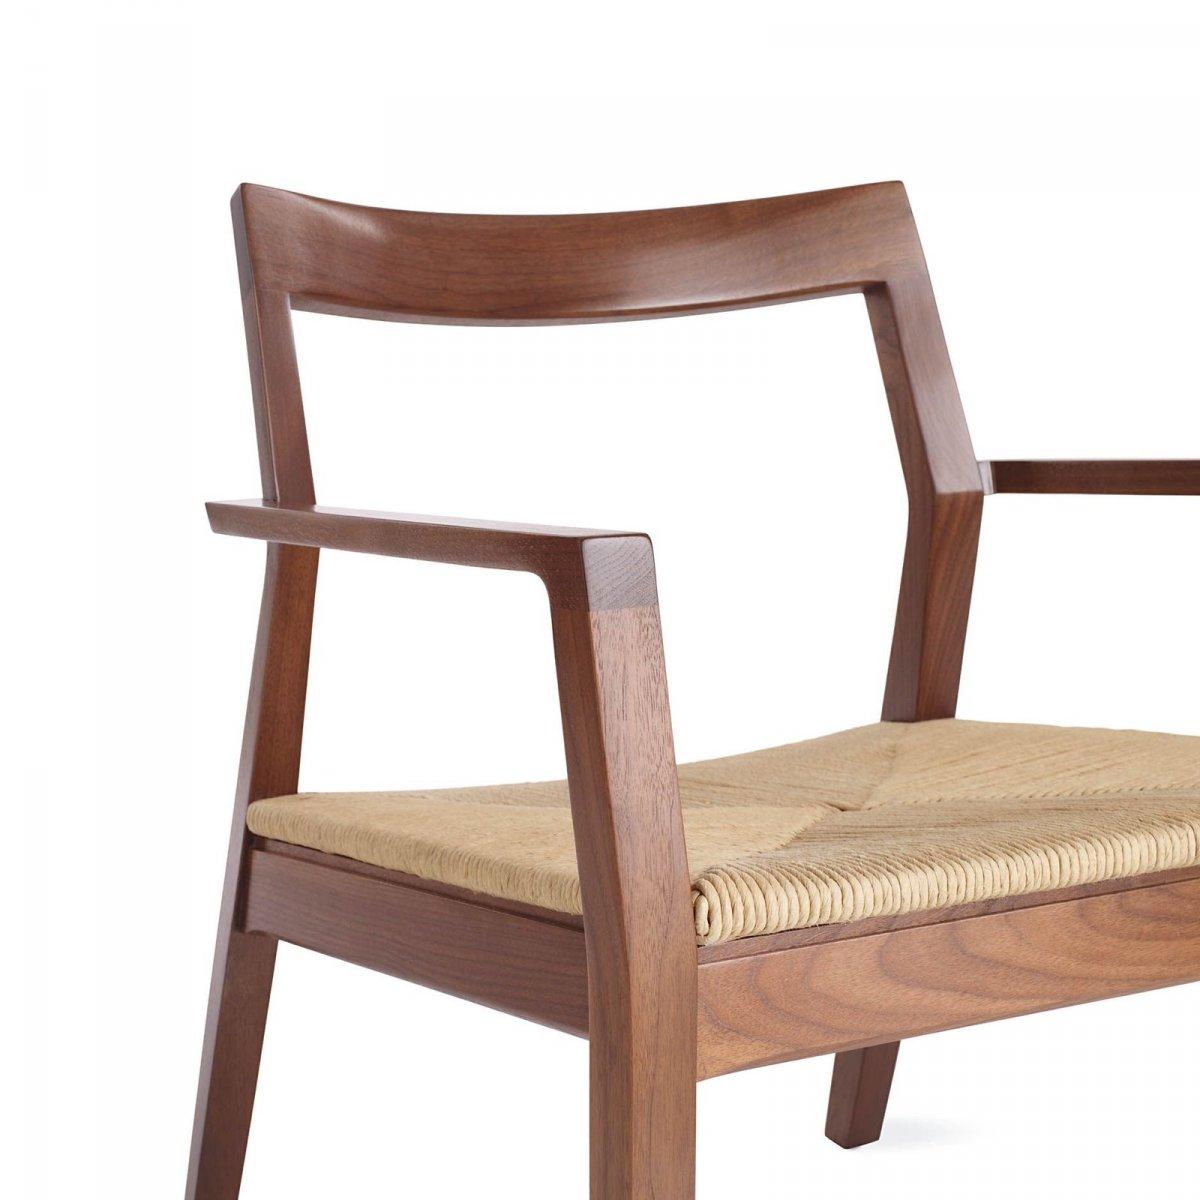 Krusin Lounge Arm Chair, walnut, detail.